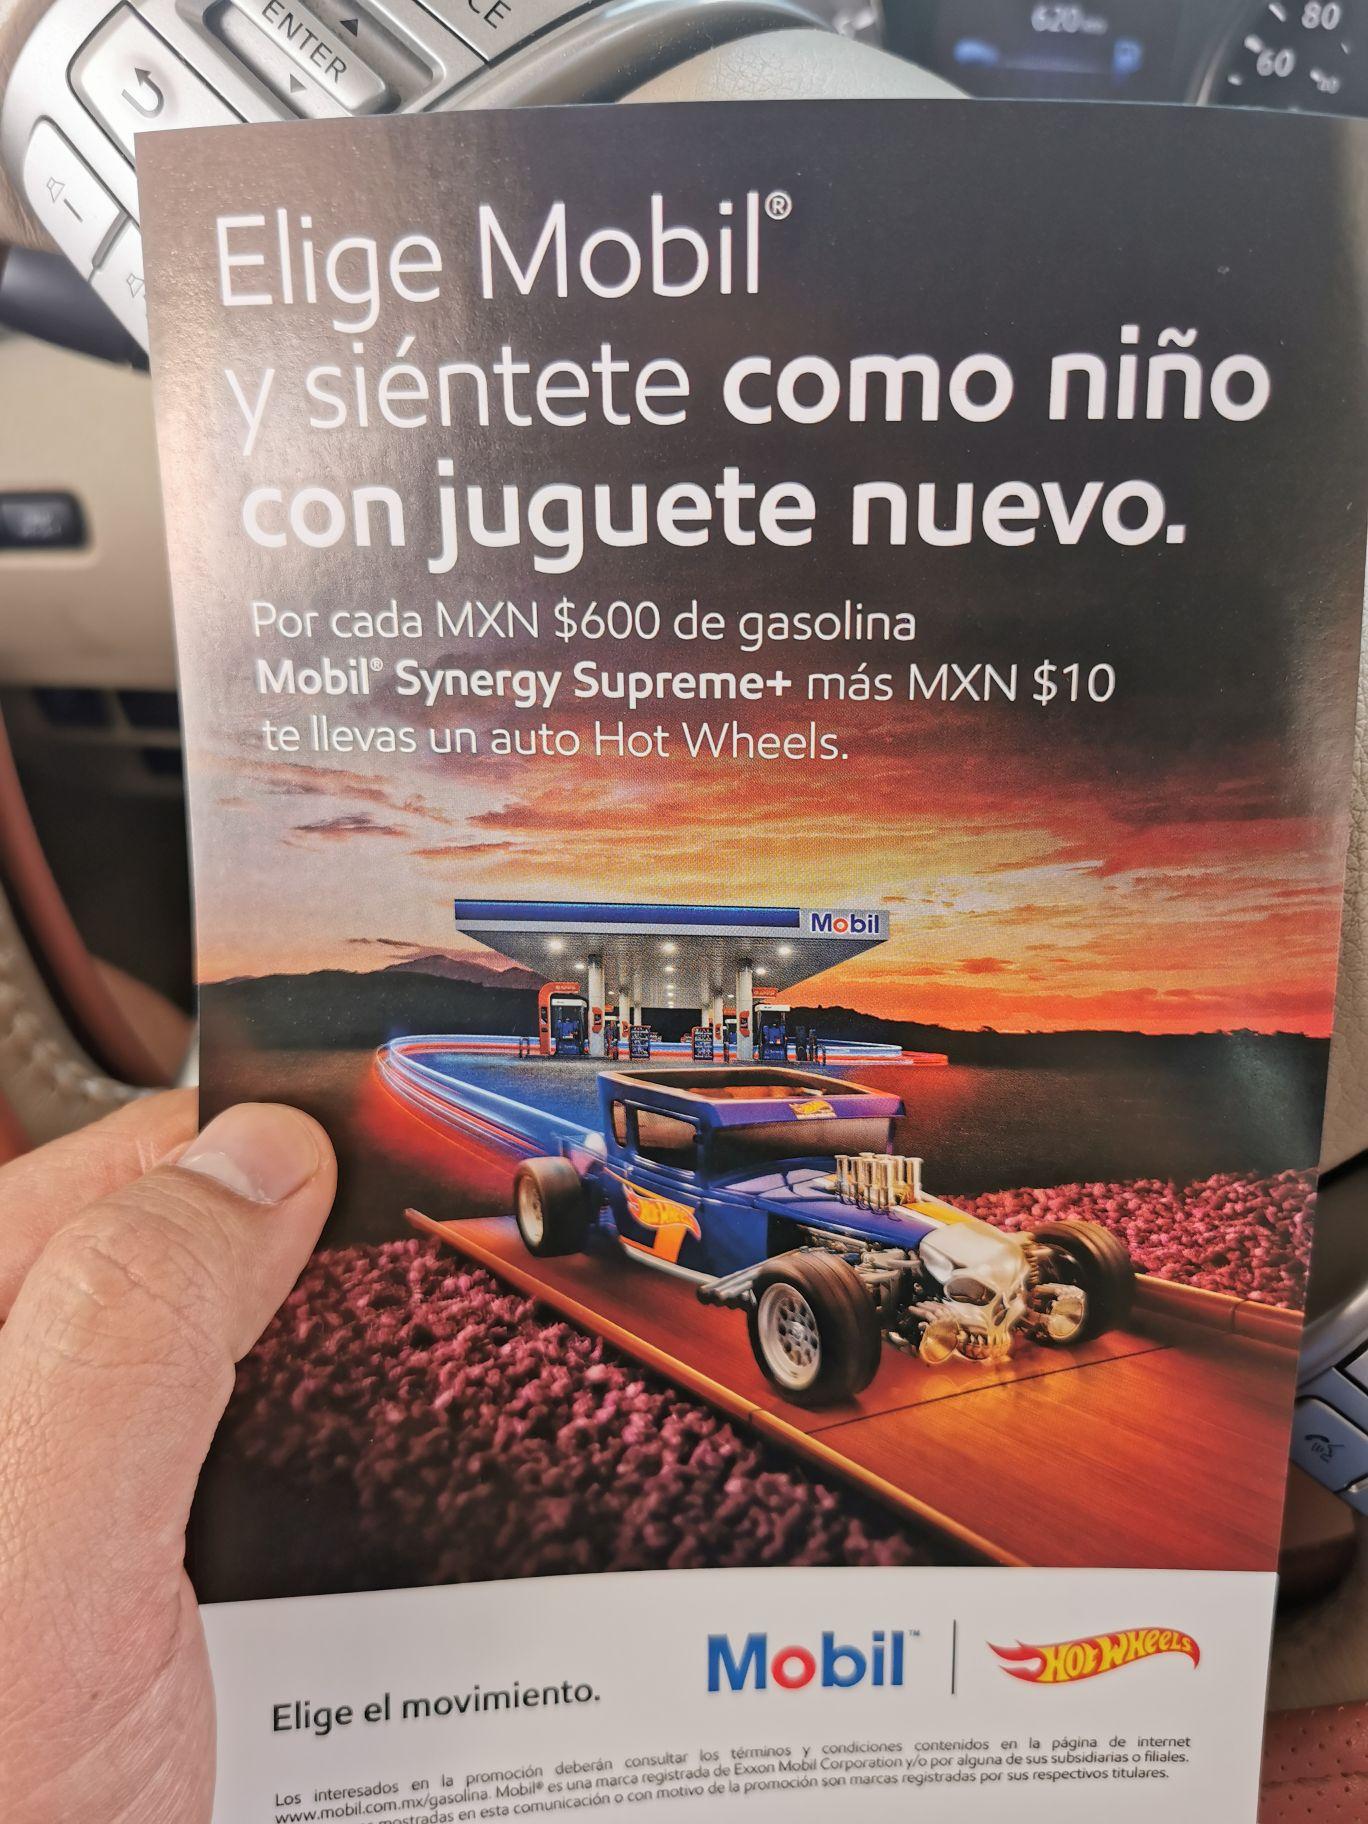 Gasolineras Mobil: Carrito Hot Wheels, por cada 600 de gasolina + $10